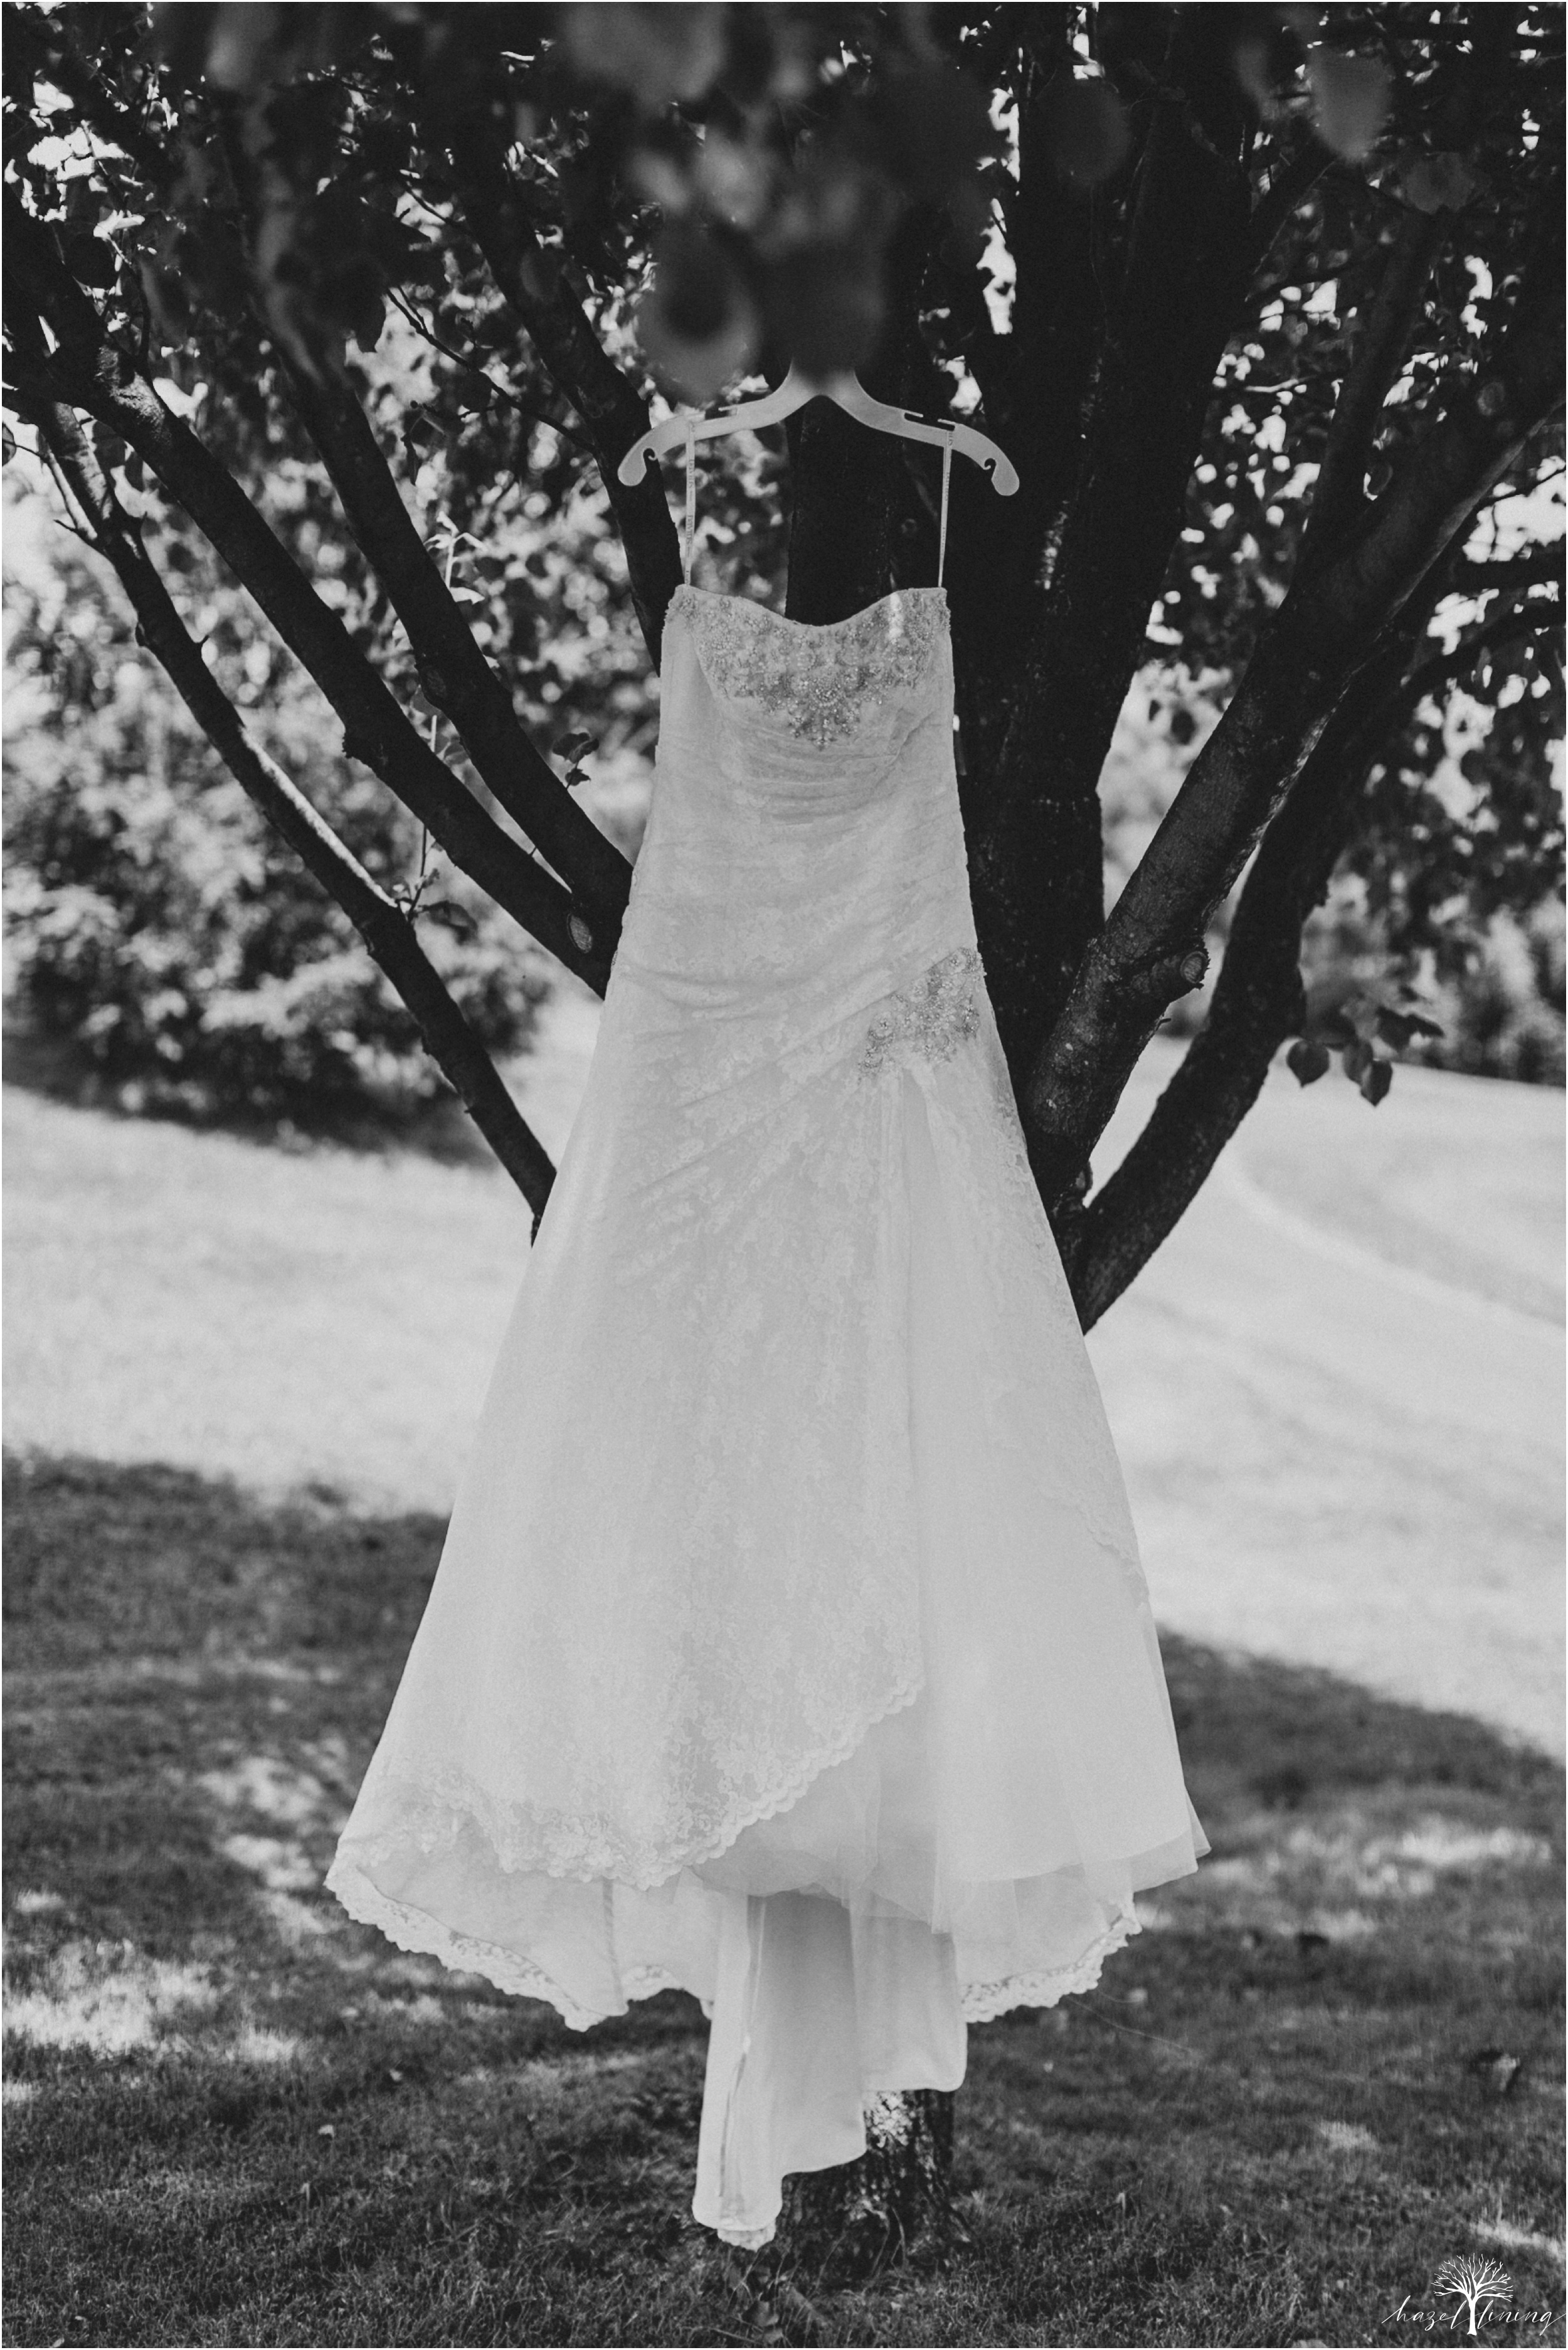 alyssa-james-stiteler-wedding-loft-and-sweet-water-cc-pennsburg-pennsylvania-hazel-lining-travel-wedding-elopement-photography_0013.jpg